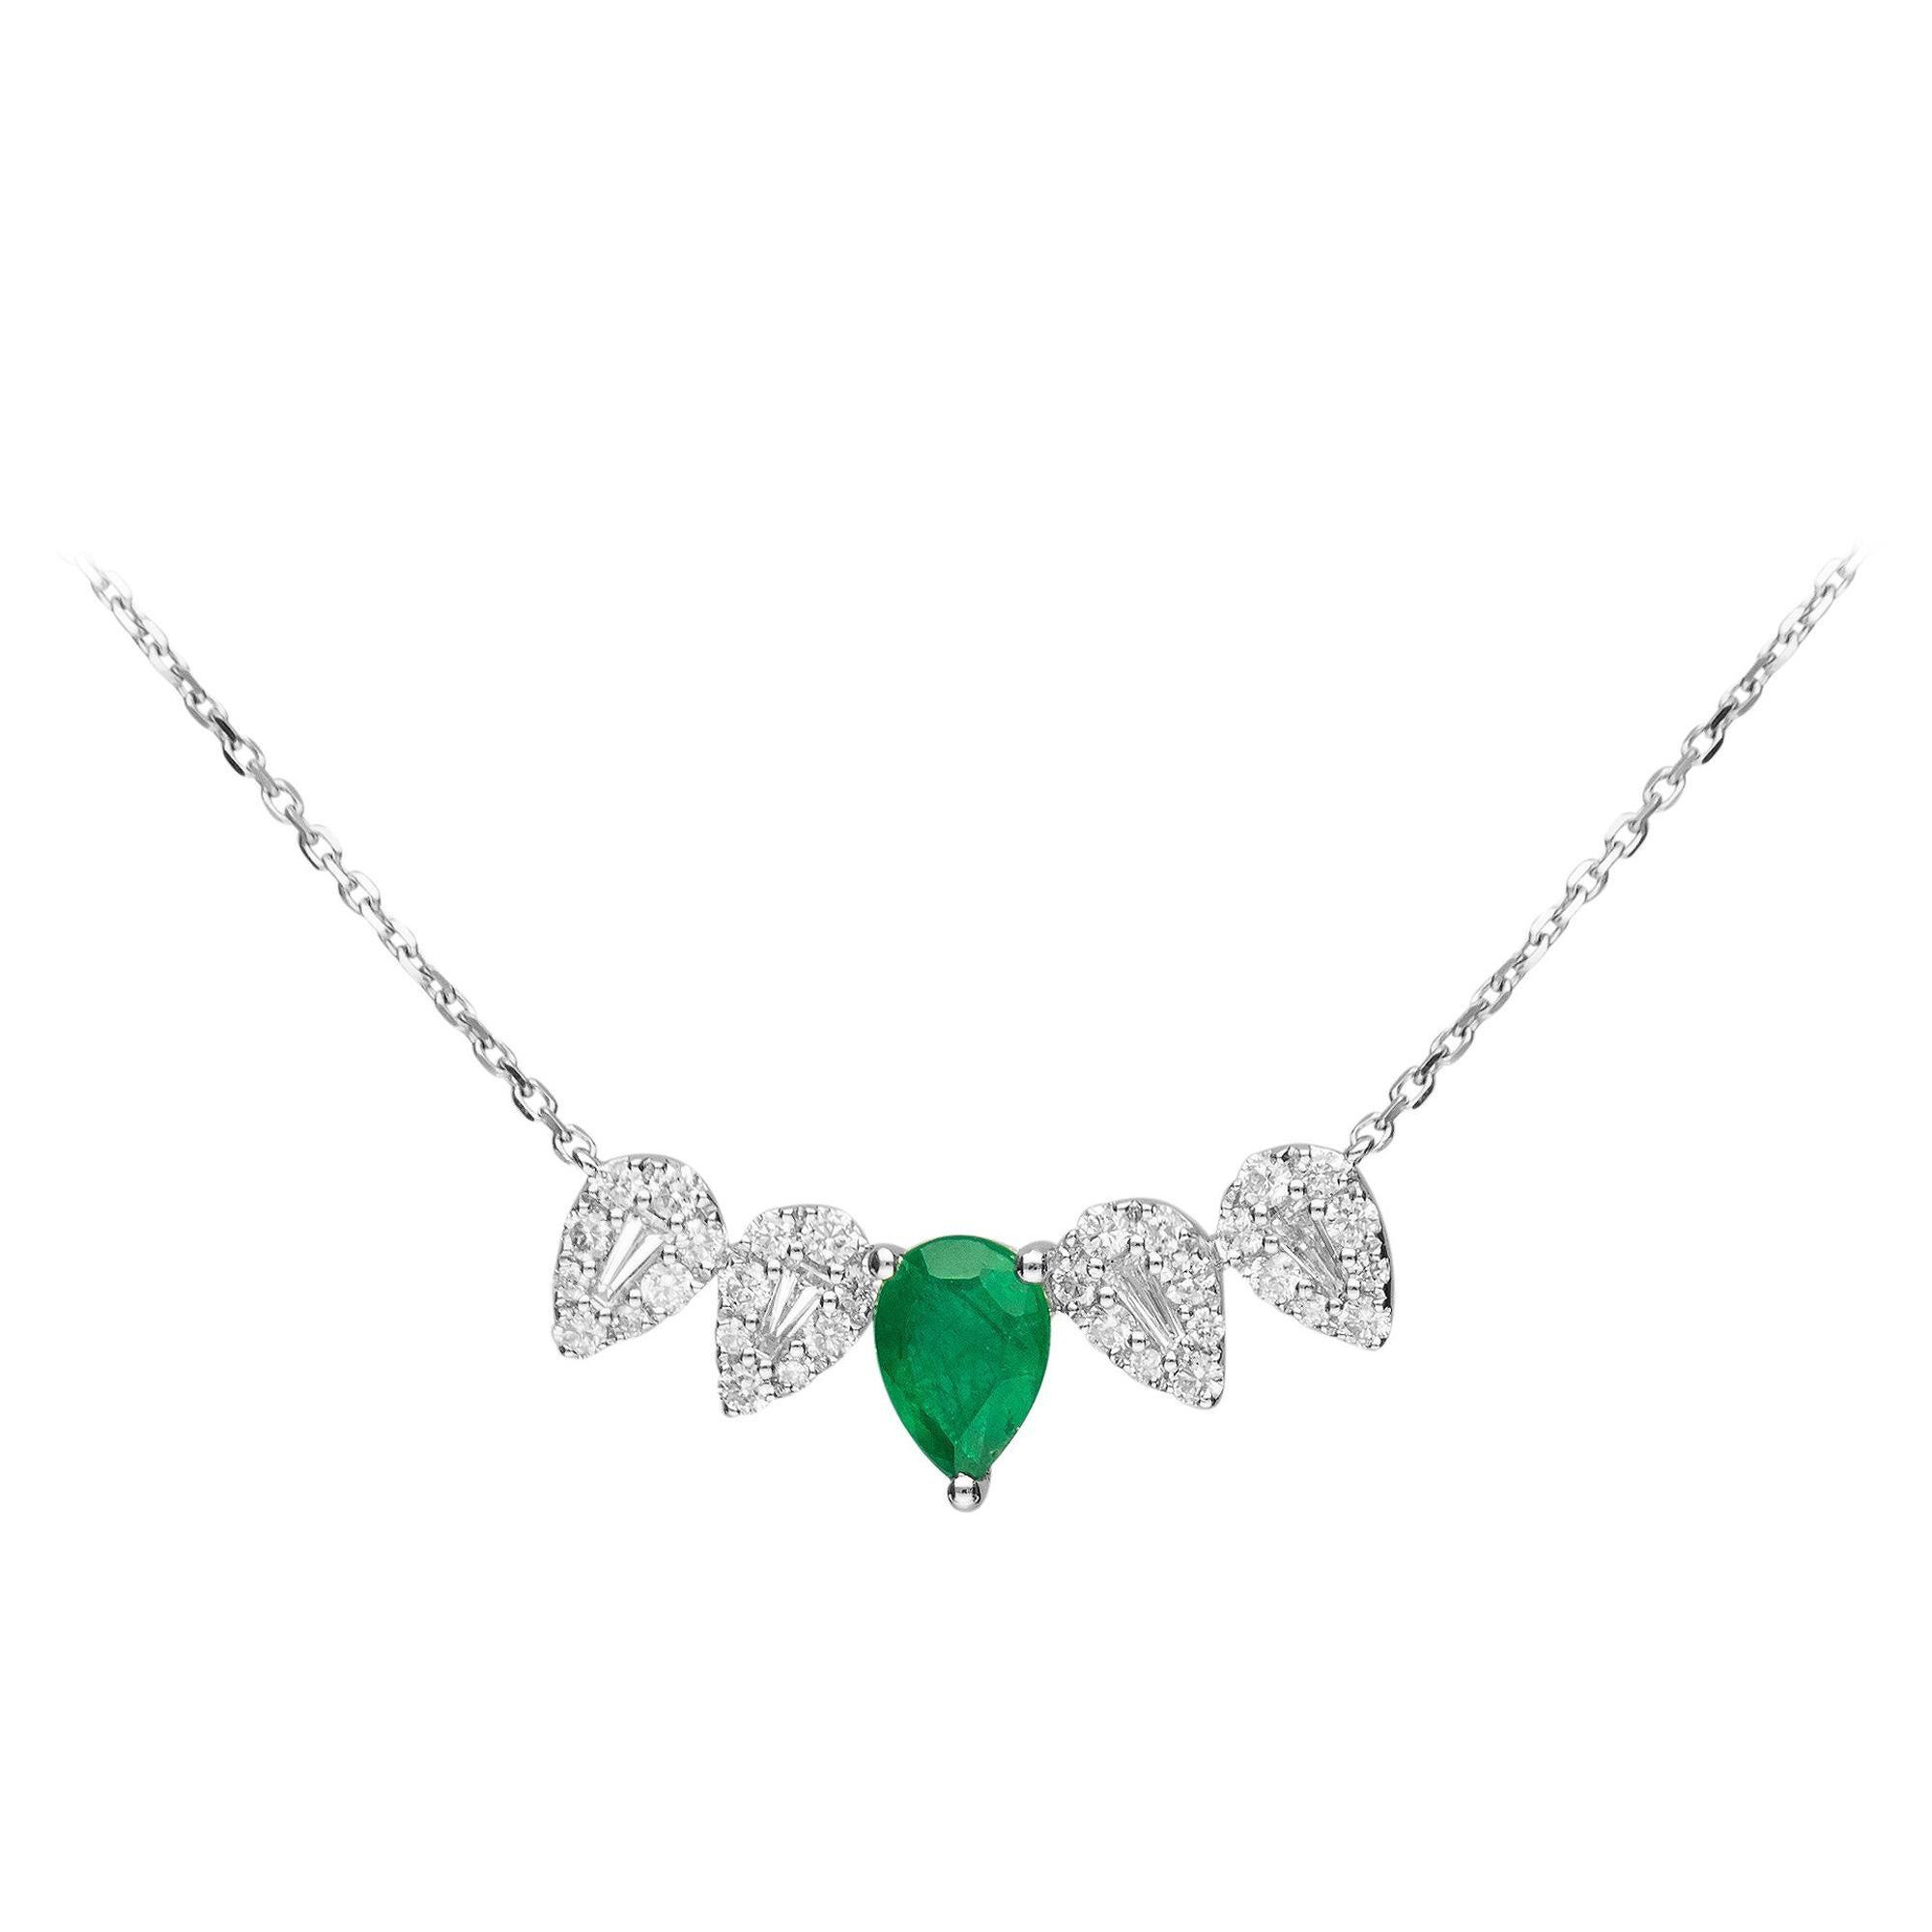 3/5 Carat Emerald 18k White Gold Necklace